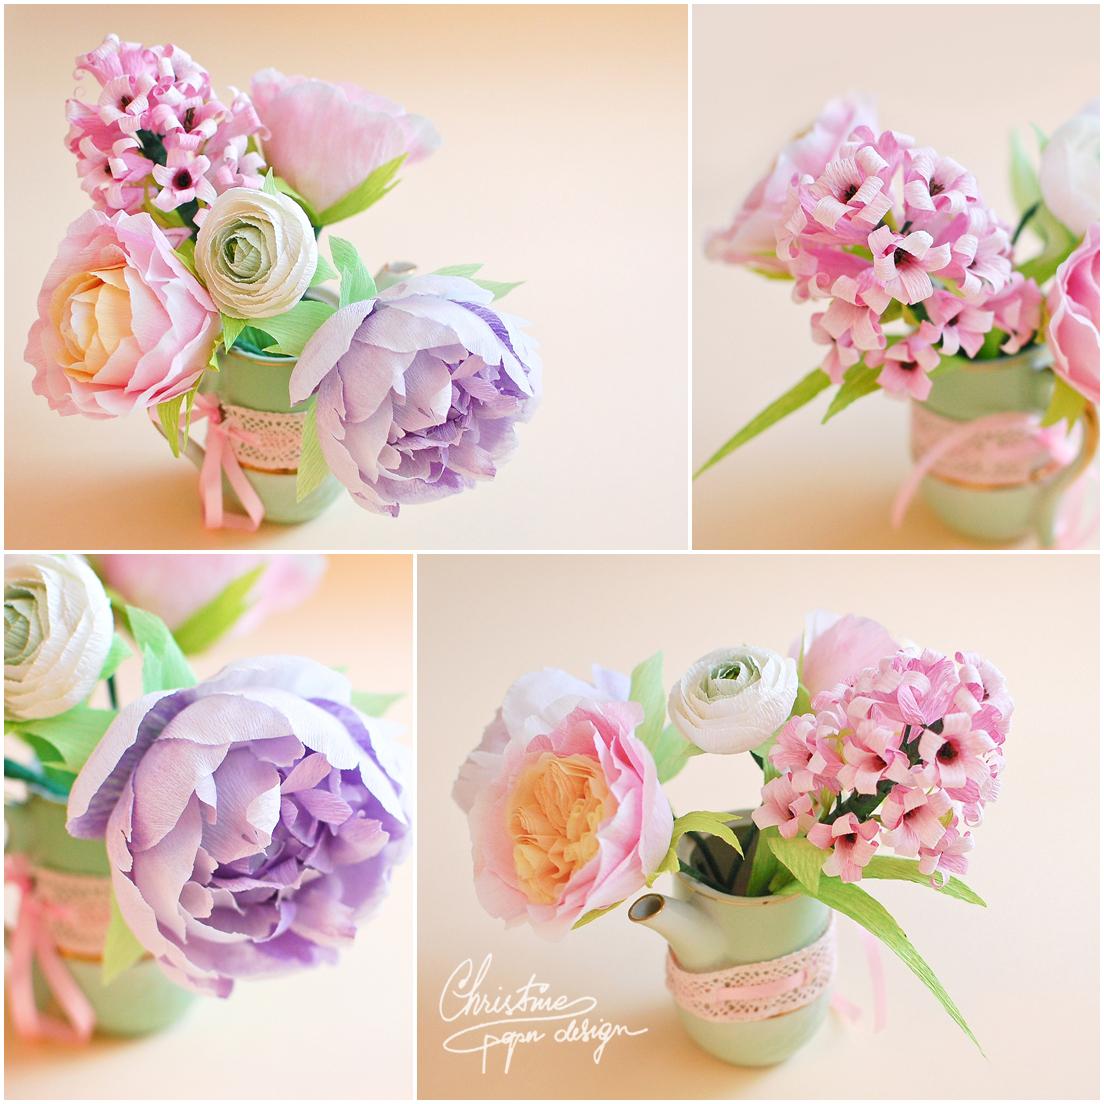 Christine paper design - spring paper flowers (3)